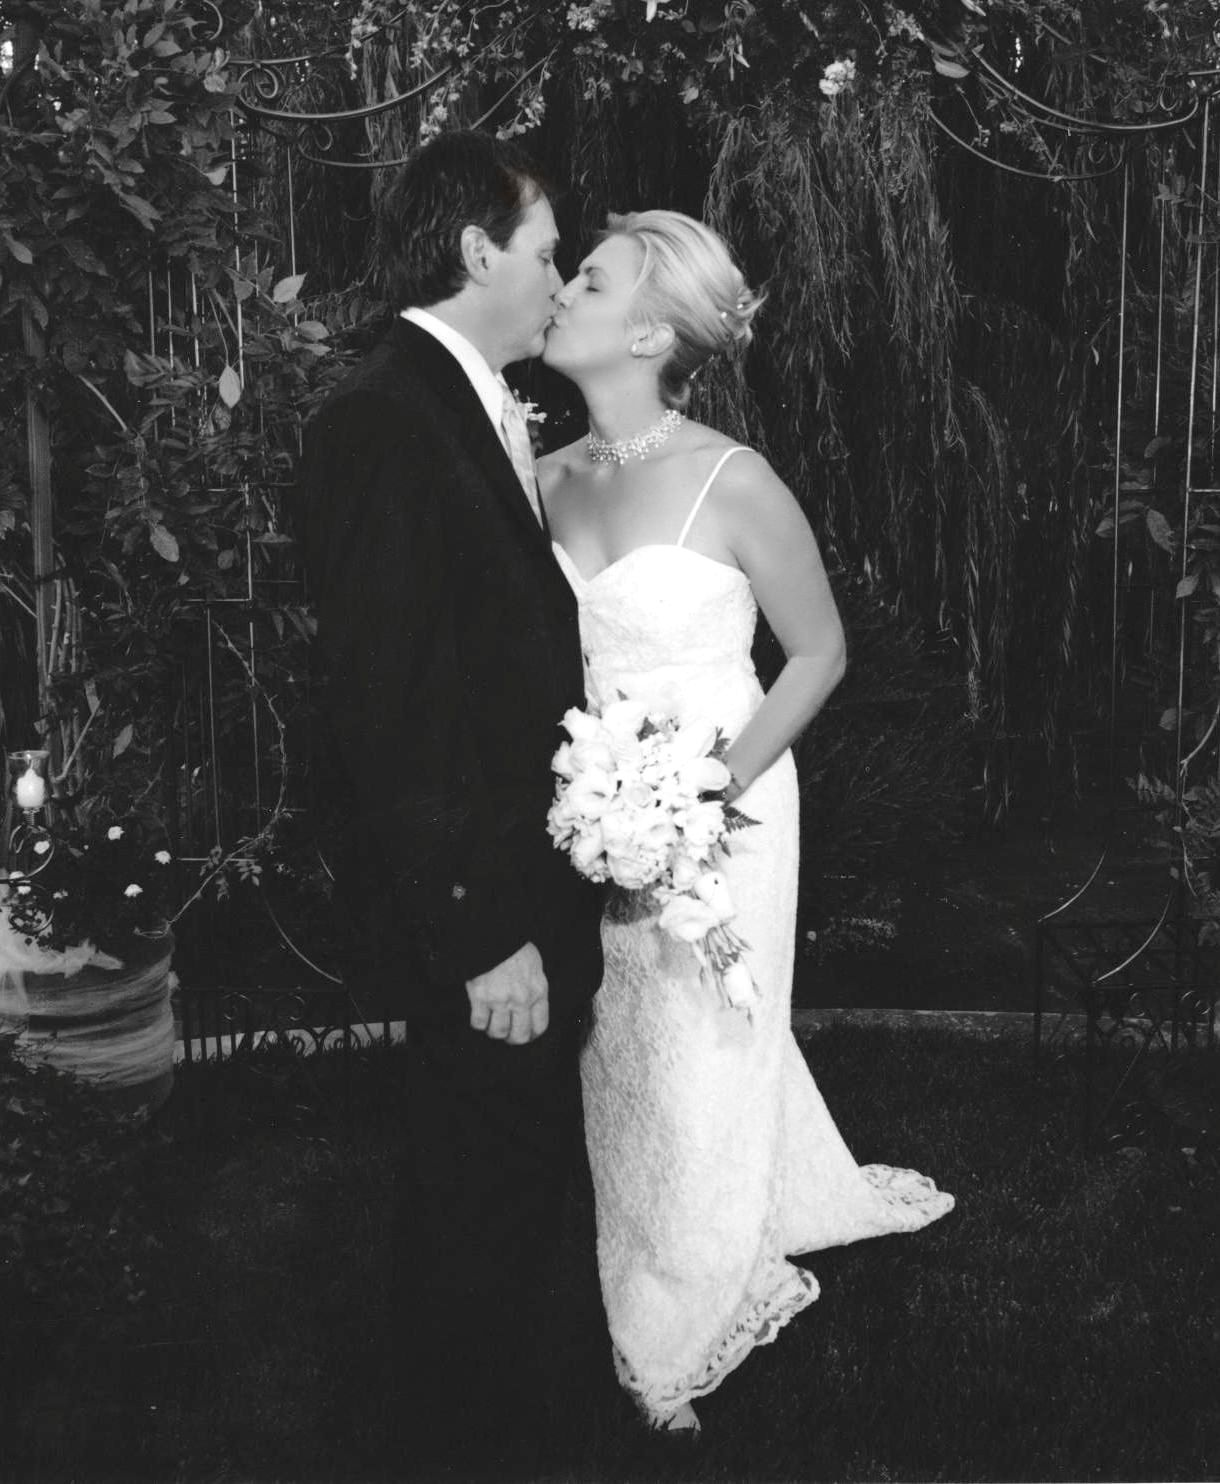 scott and heather before wedding kiss b and w.jpg